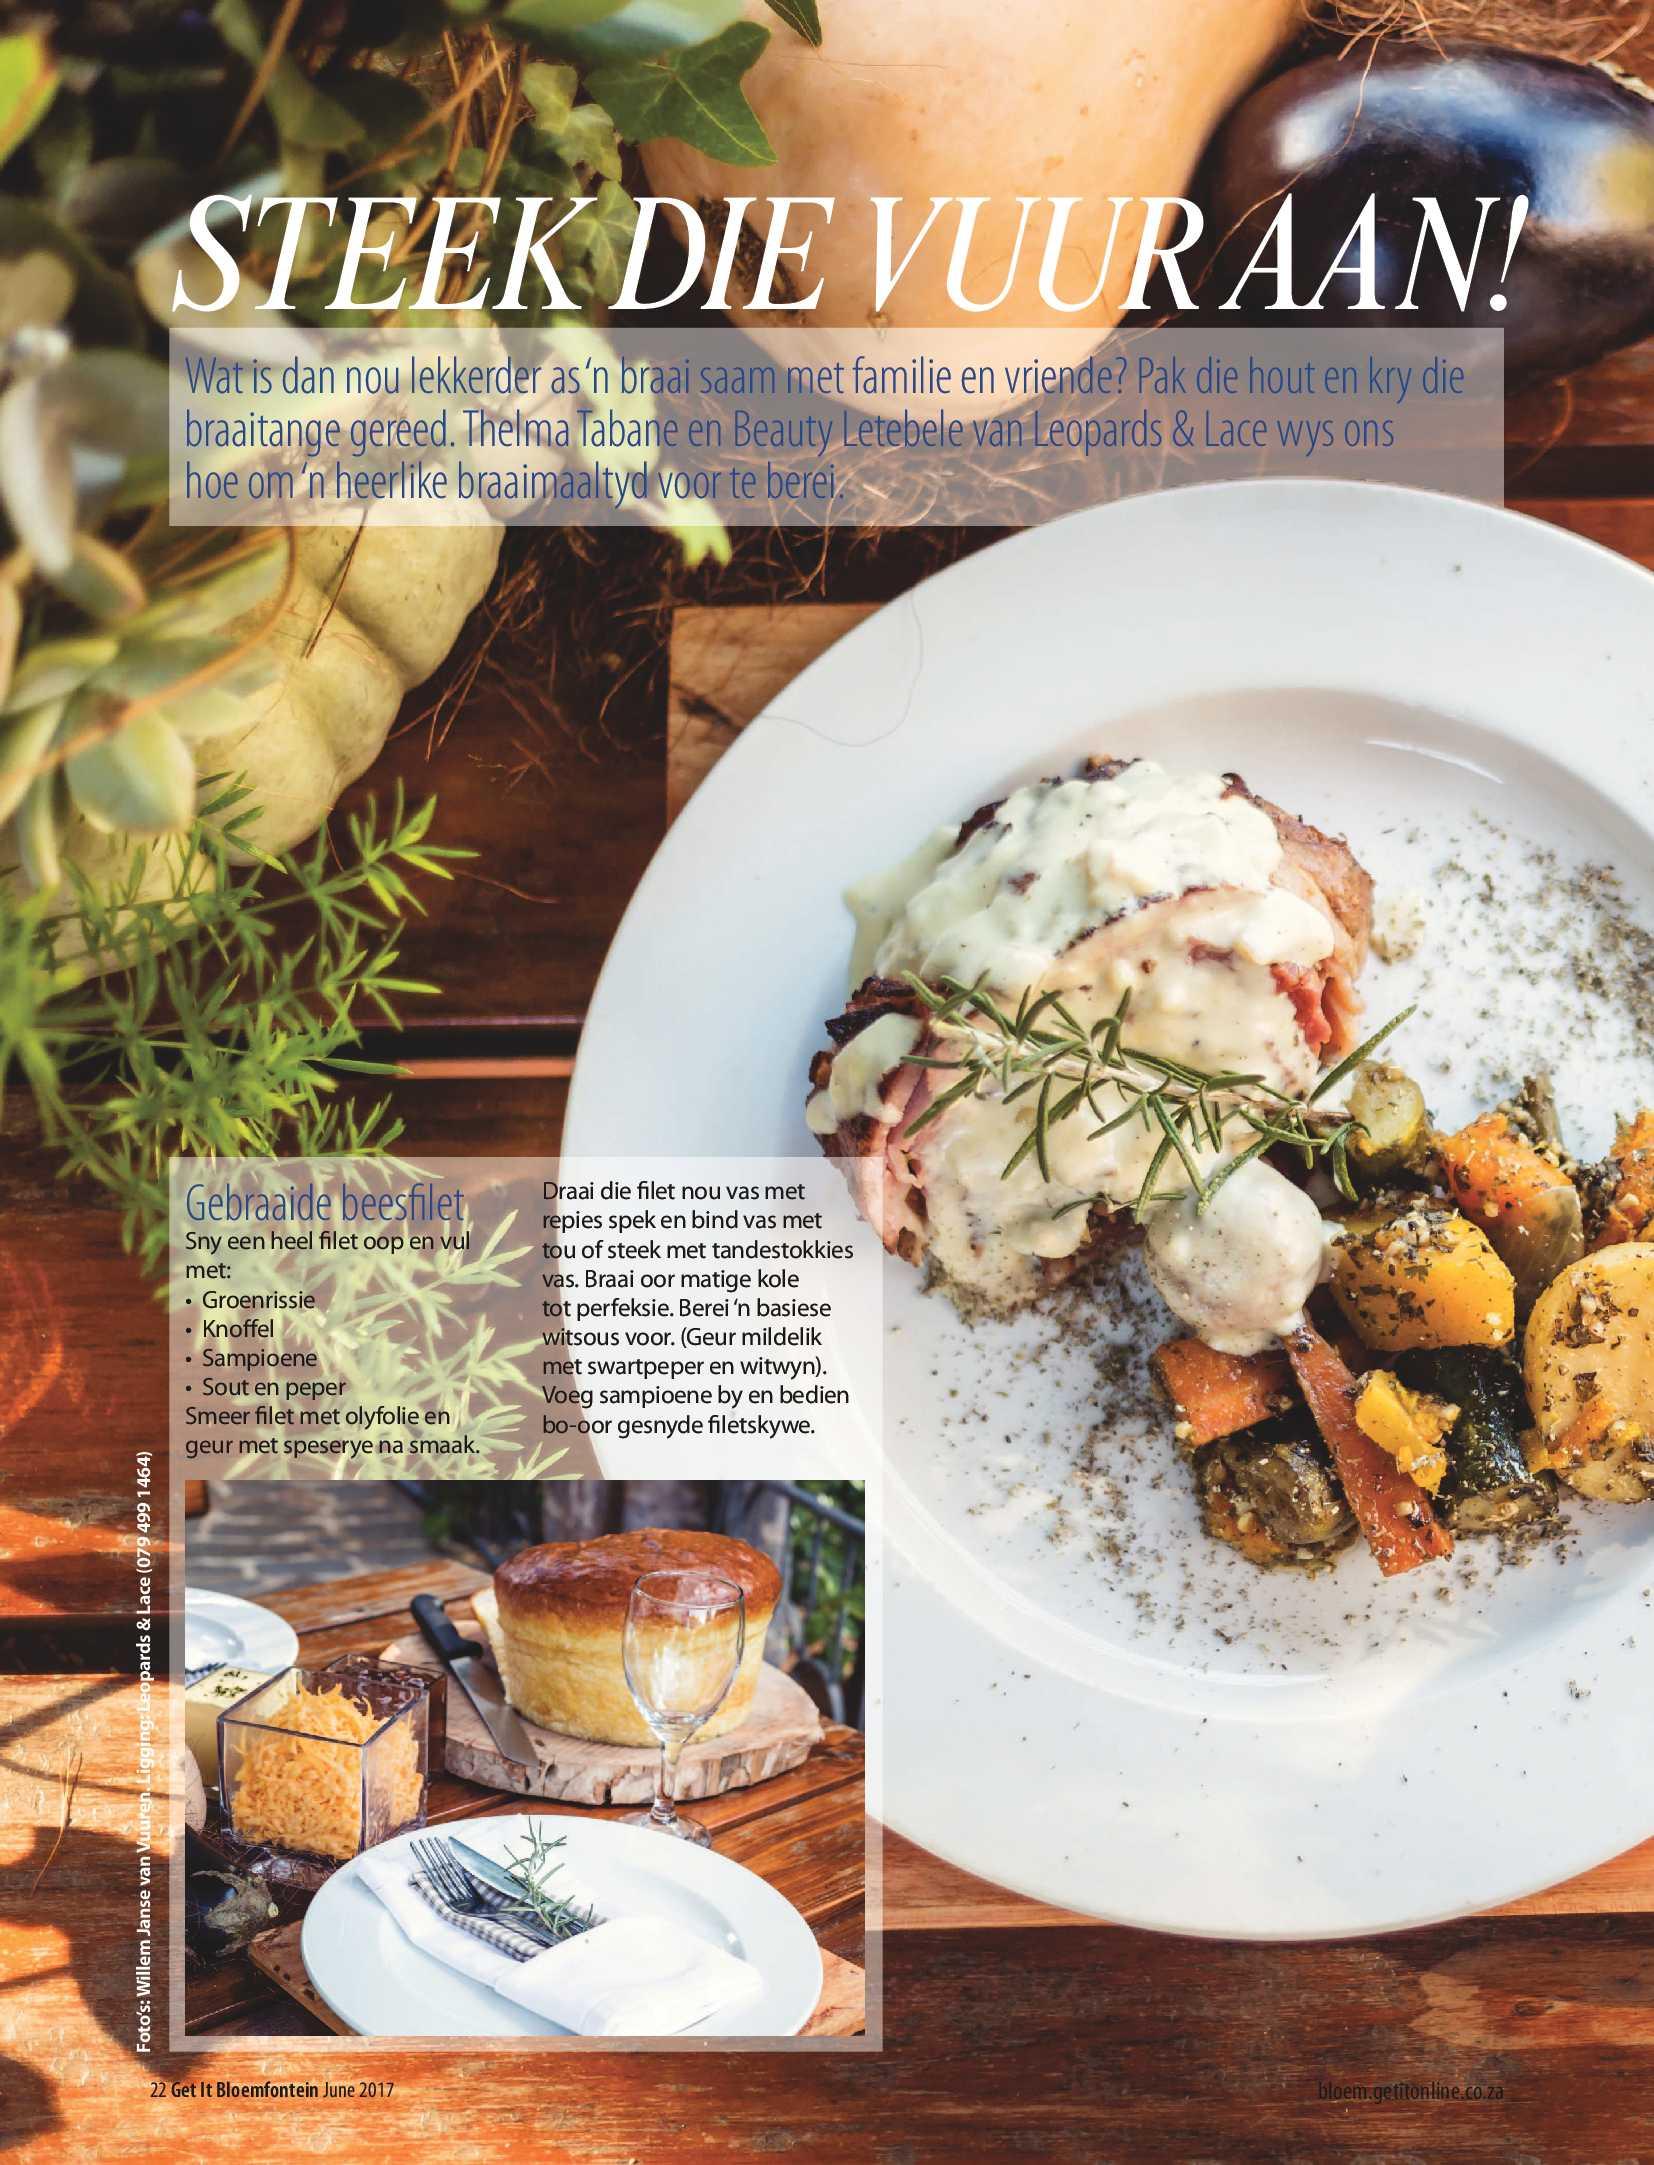 get-bloemfontein-june-2017-epapers-page-24